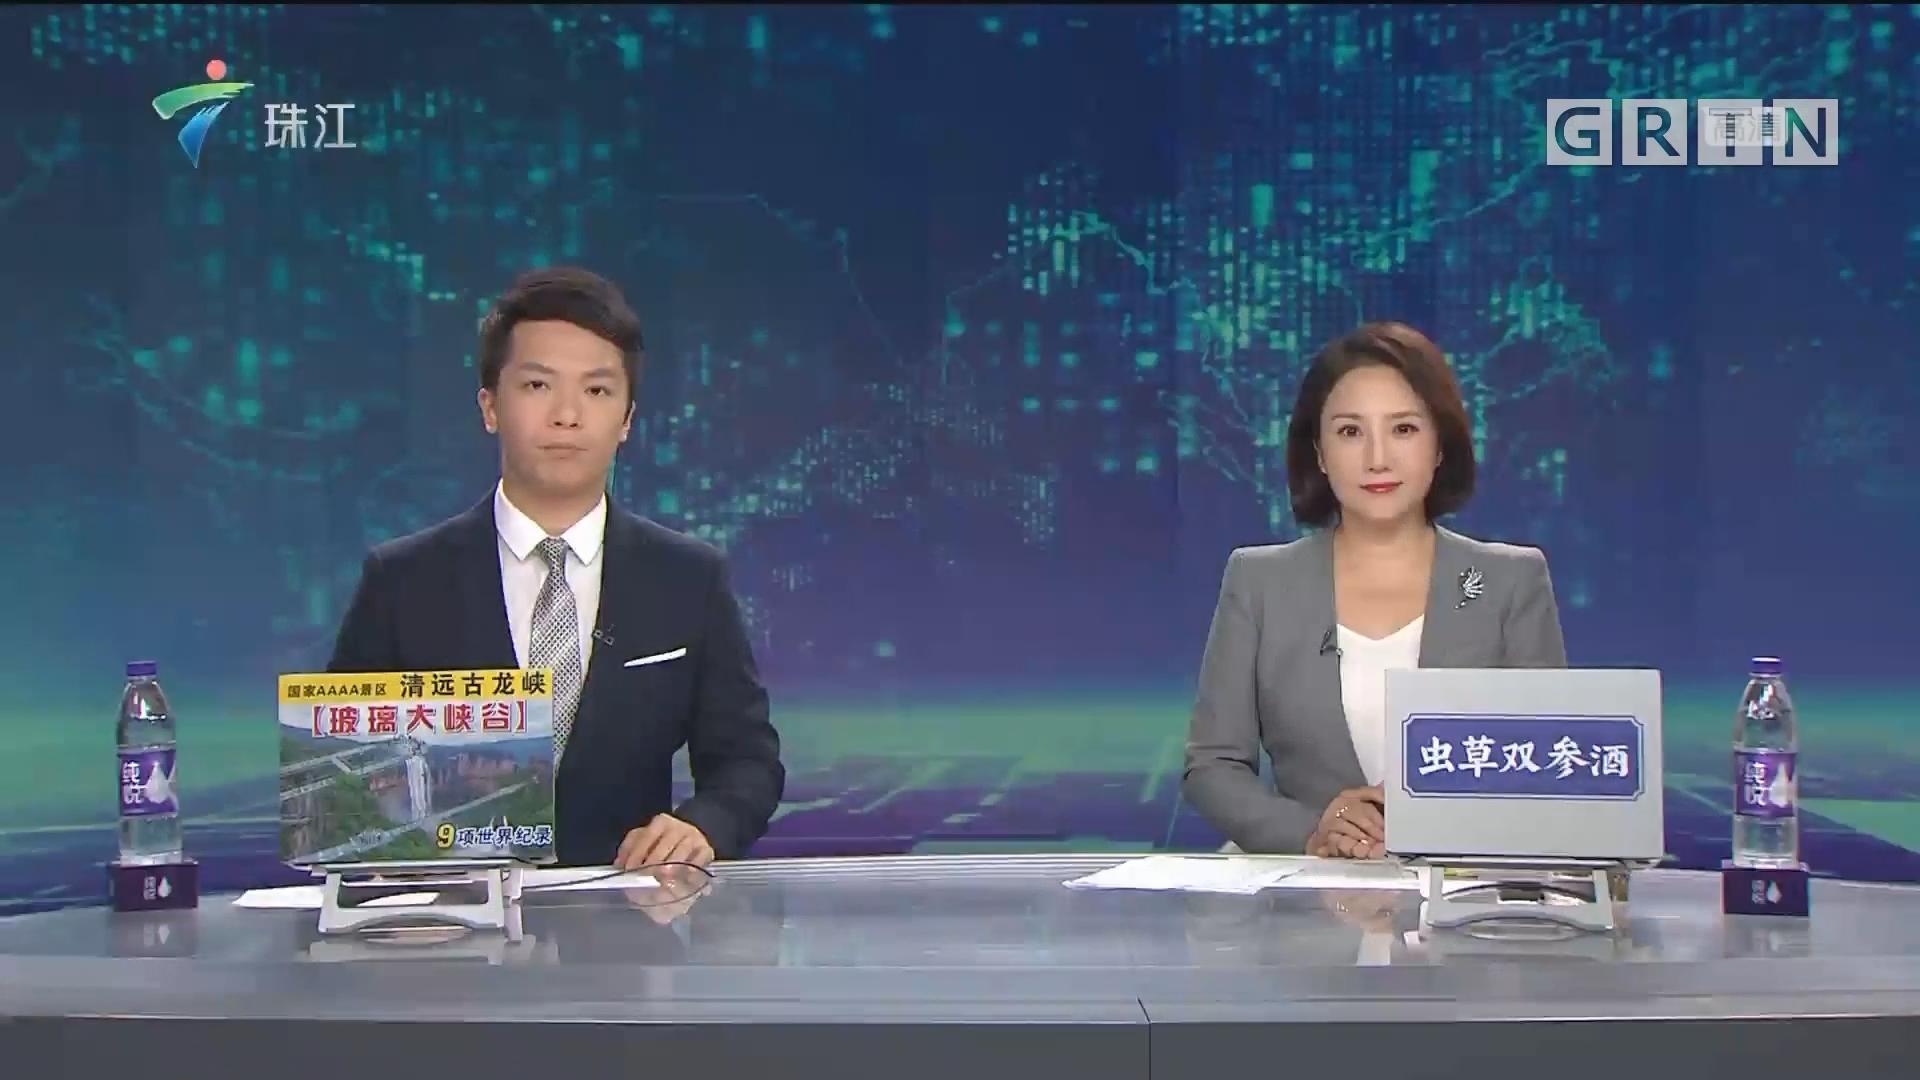 [HD][2019-09-11]珠江新闻眼:公安部推便民举措 购车上牌可一站办结